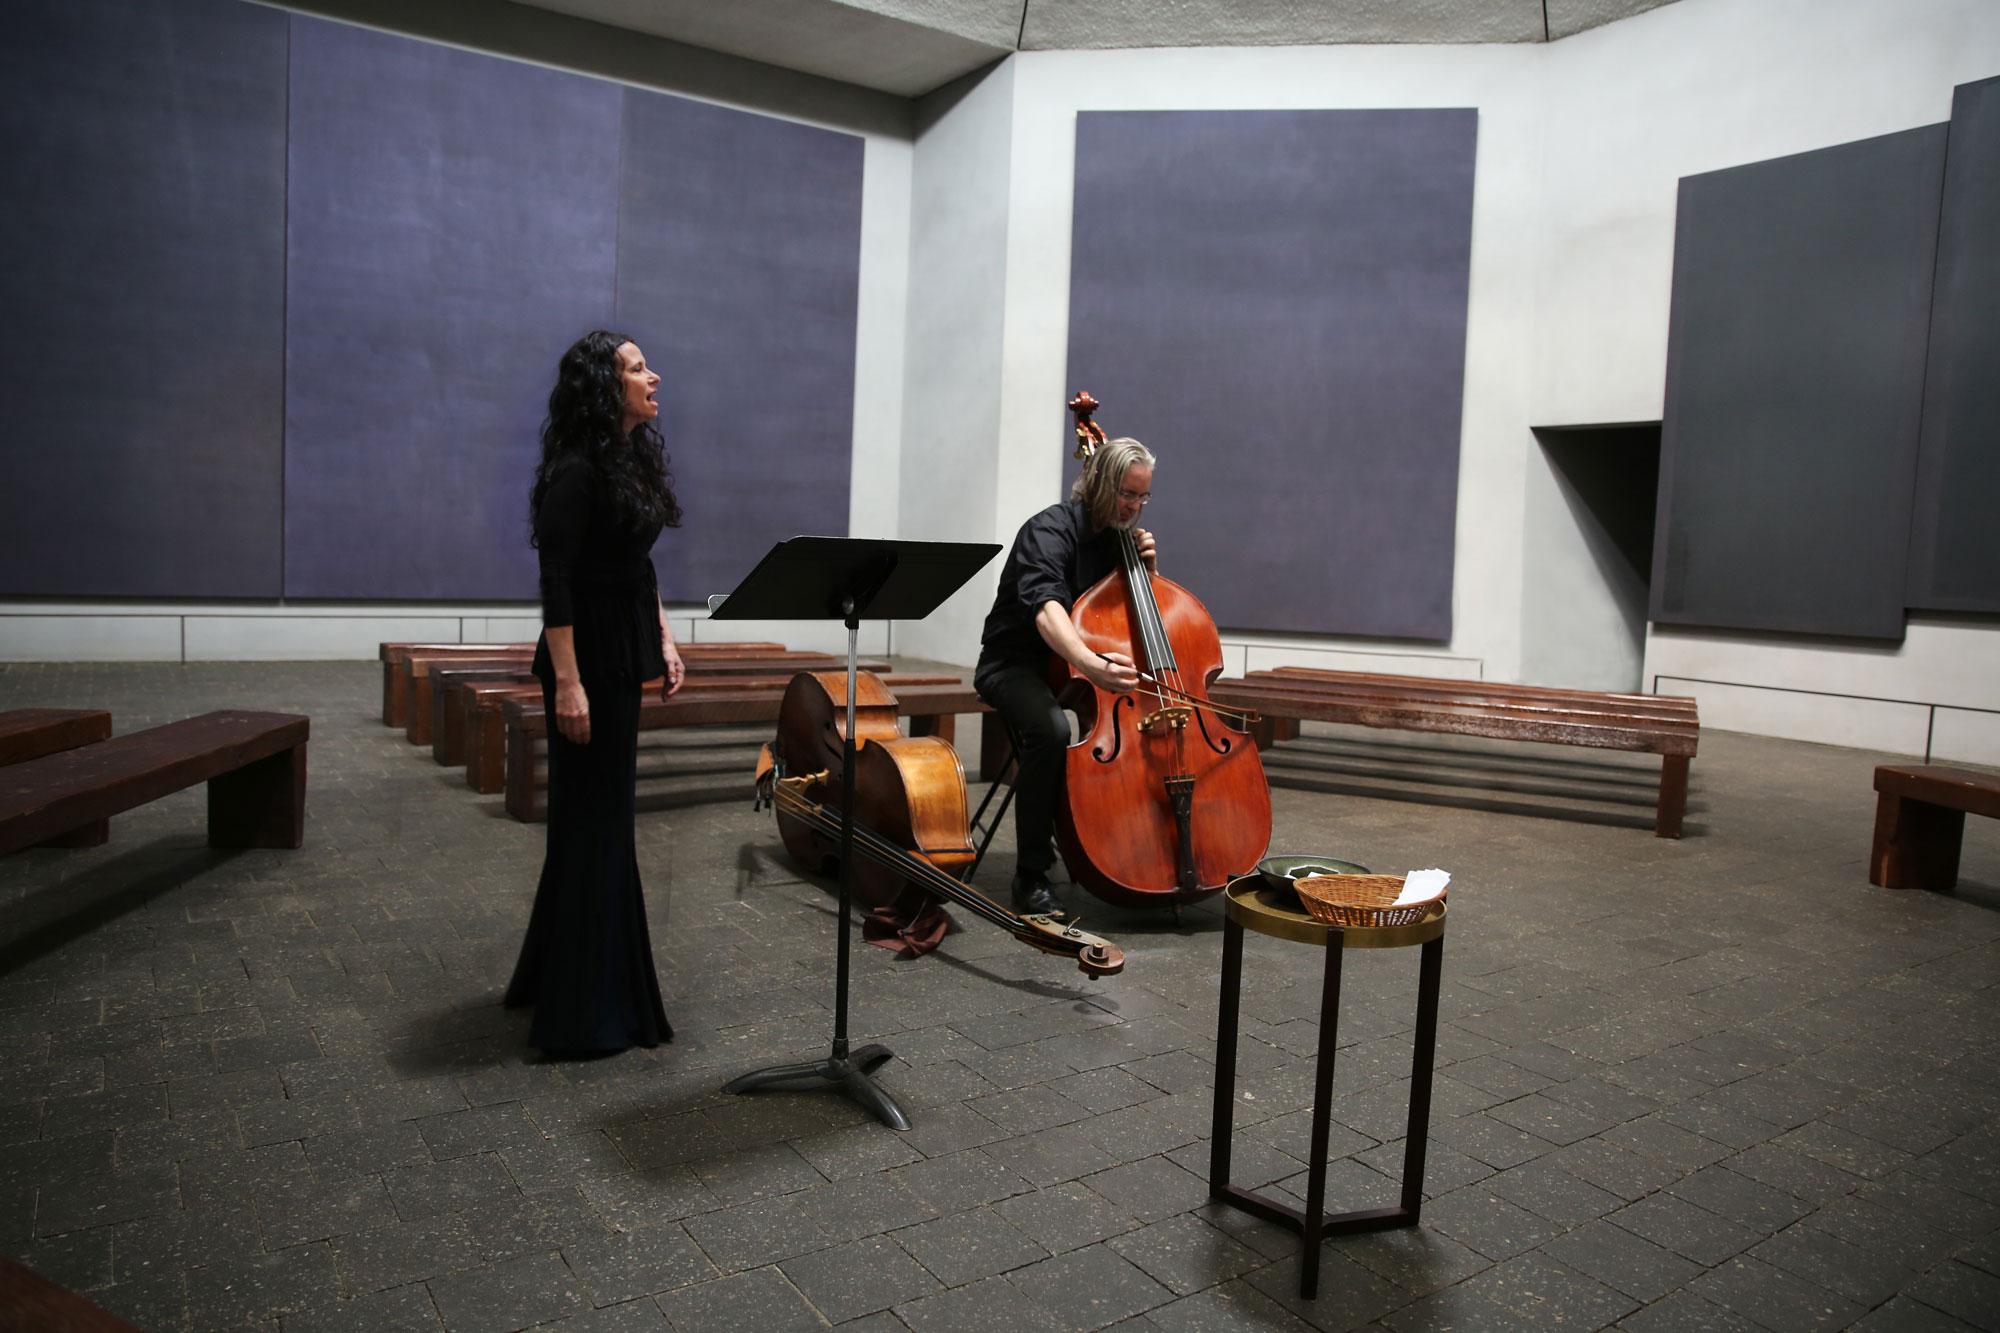 Anecdote of the Spirit at The Rothko Chapel. Misha Penton, soprano & concept. Thomas Helton, double bass. MenilFest 2017. Photo: D. Nickerson